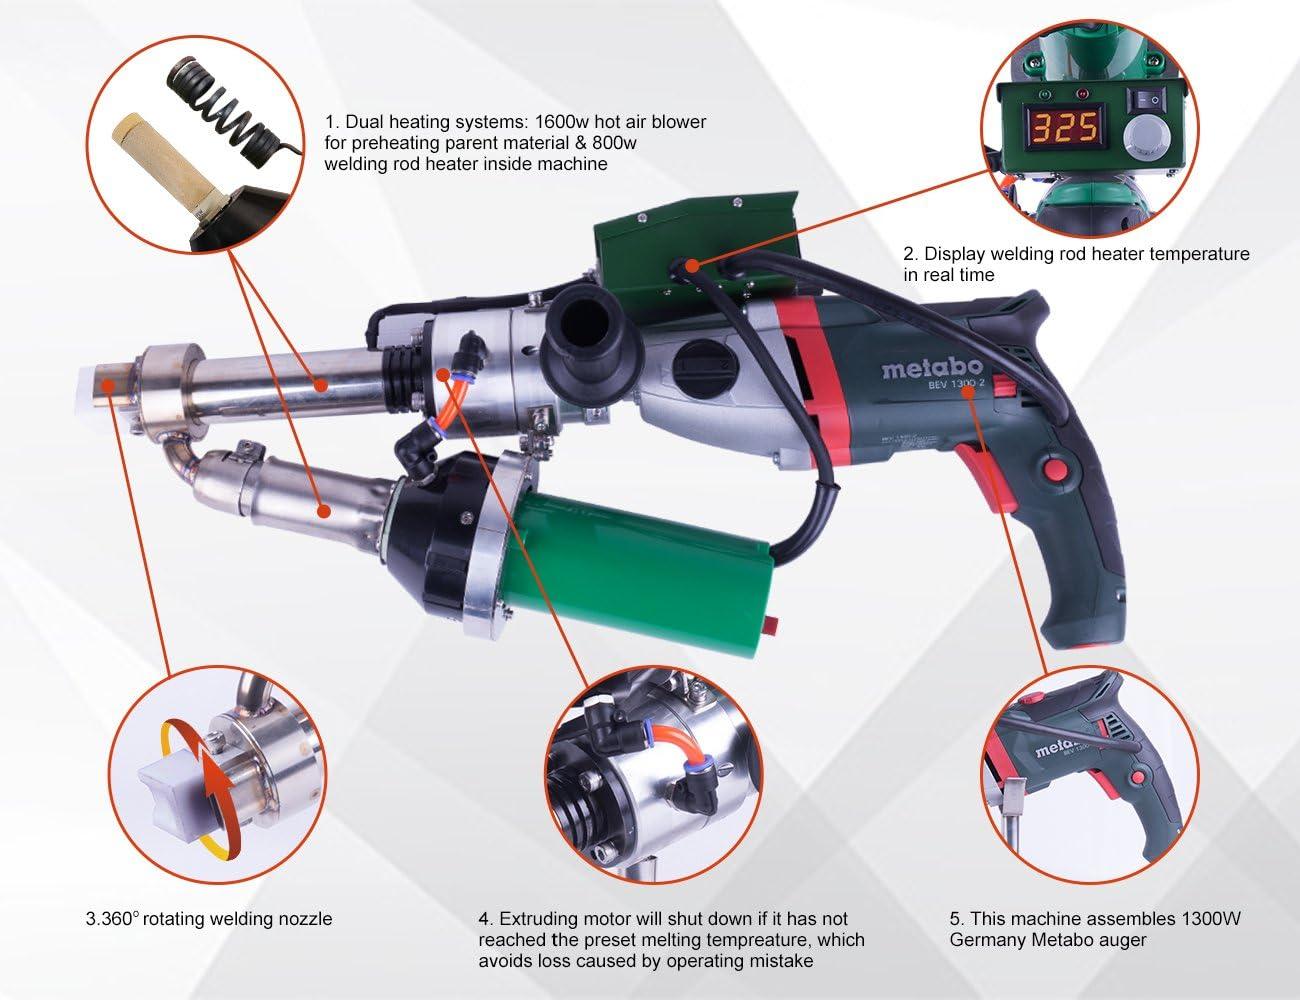 LESITE Handheld Plastic Extrusion Welder Kit for Fabrication /& Repair LST610A